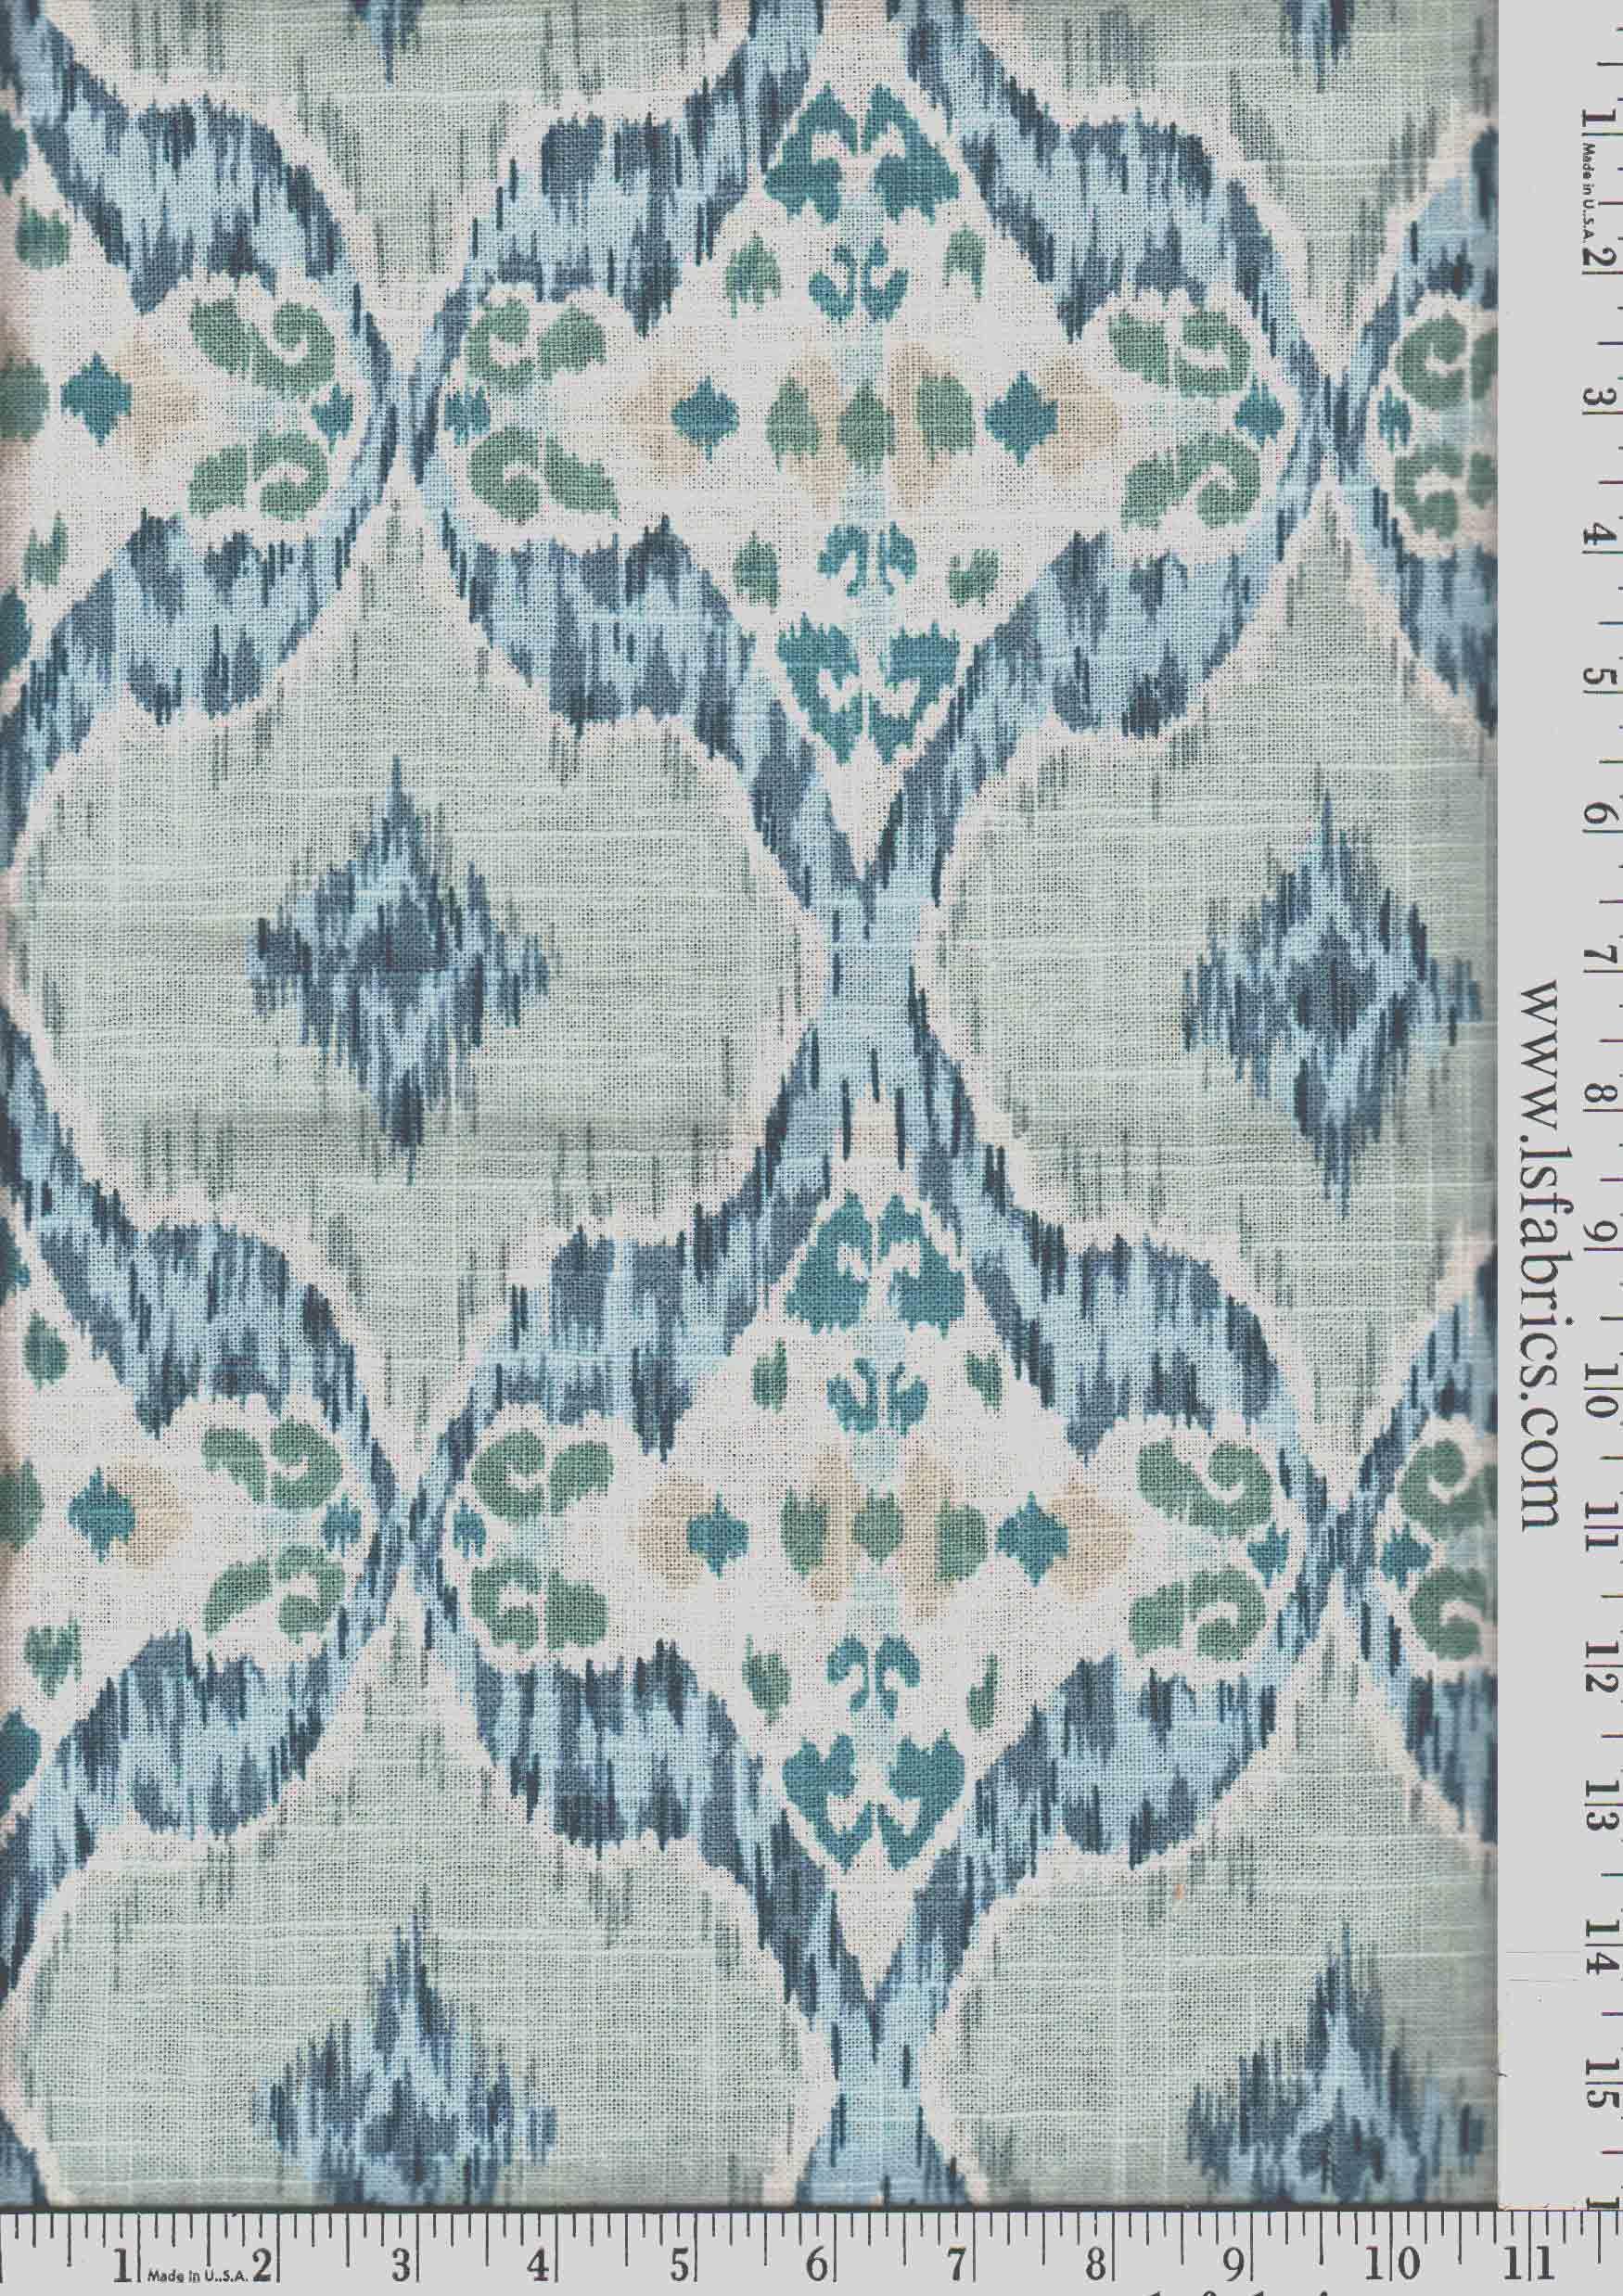 rigi ink thom filicia fabric by kravet fabric 42 cotton 38 blue green grey and ivory ikat curtain panels custom drapery in designer fabric